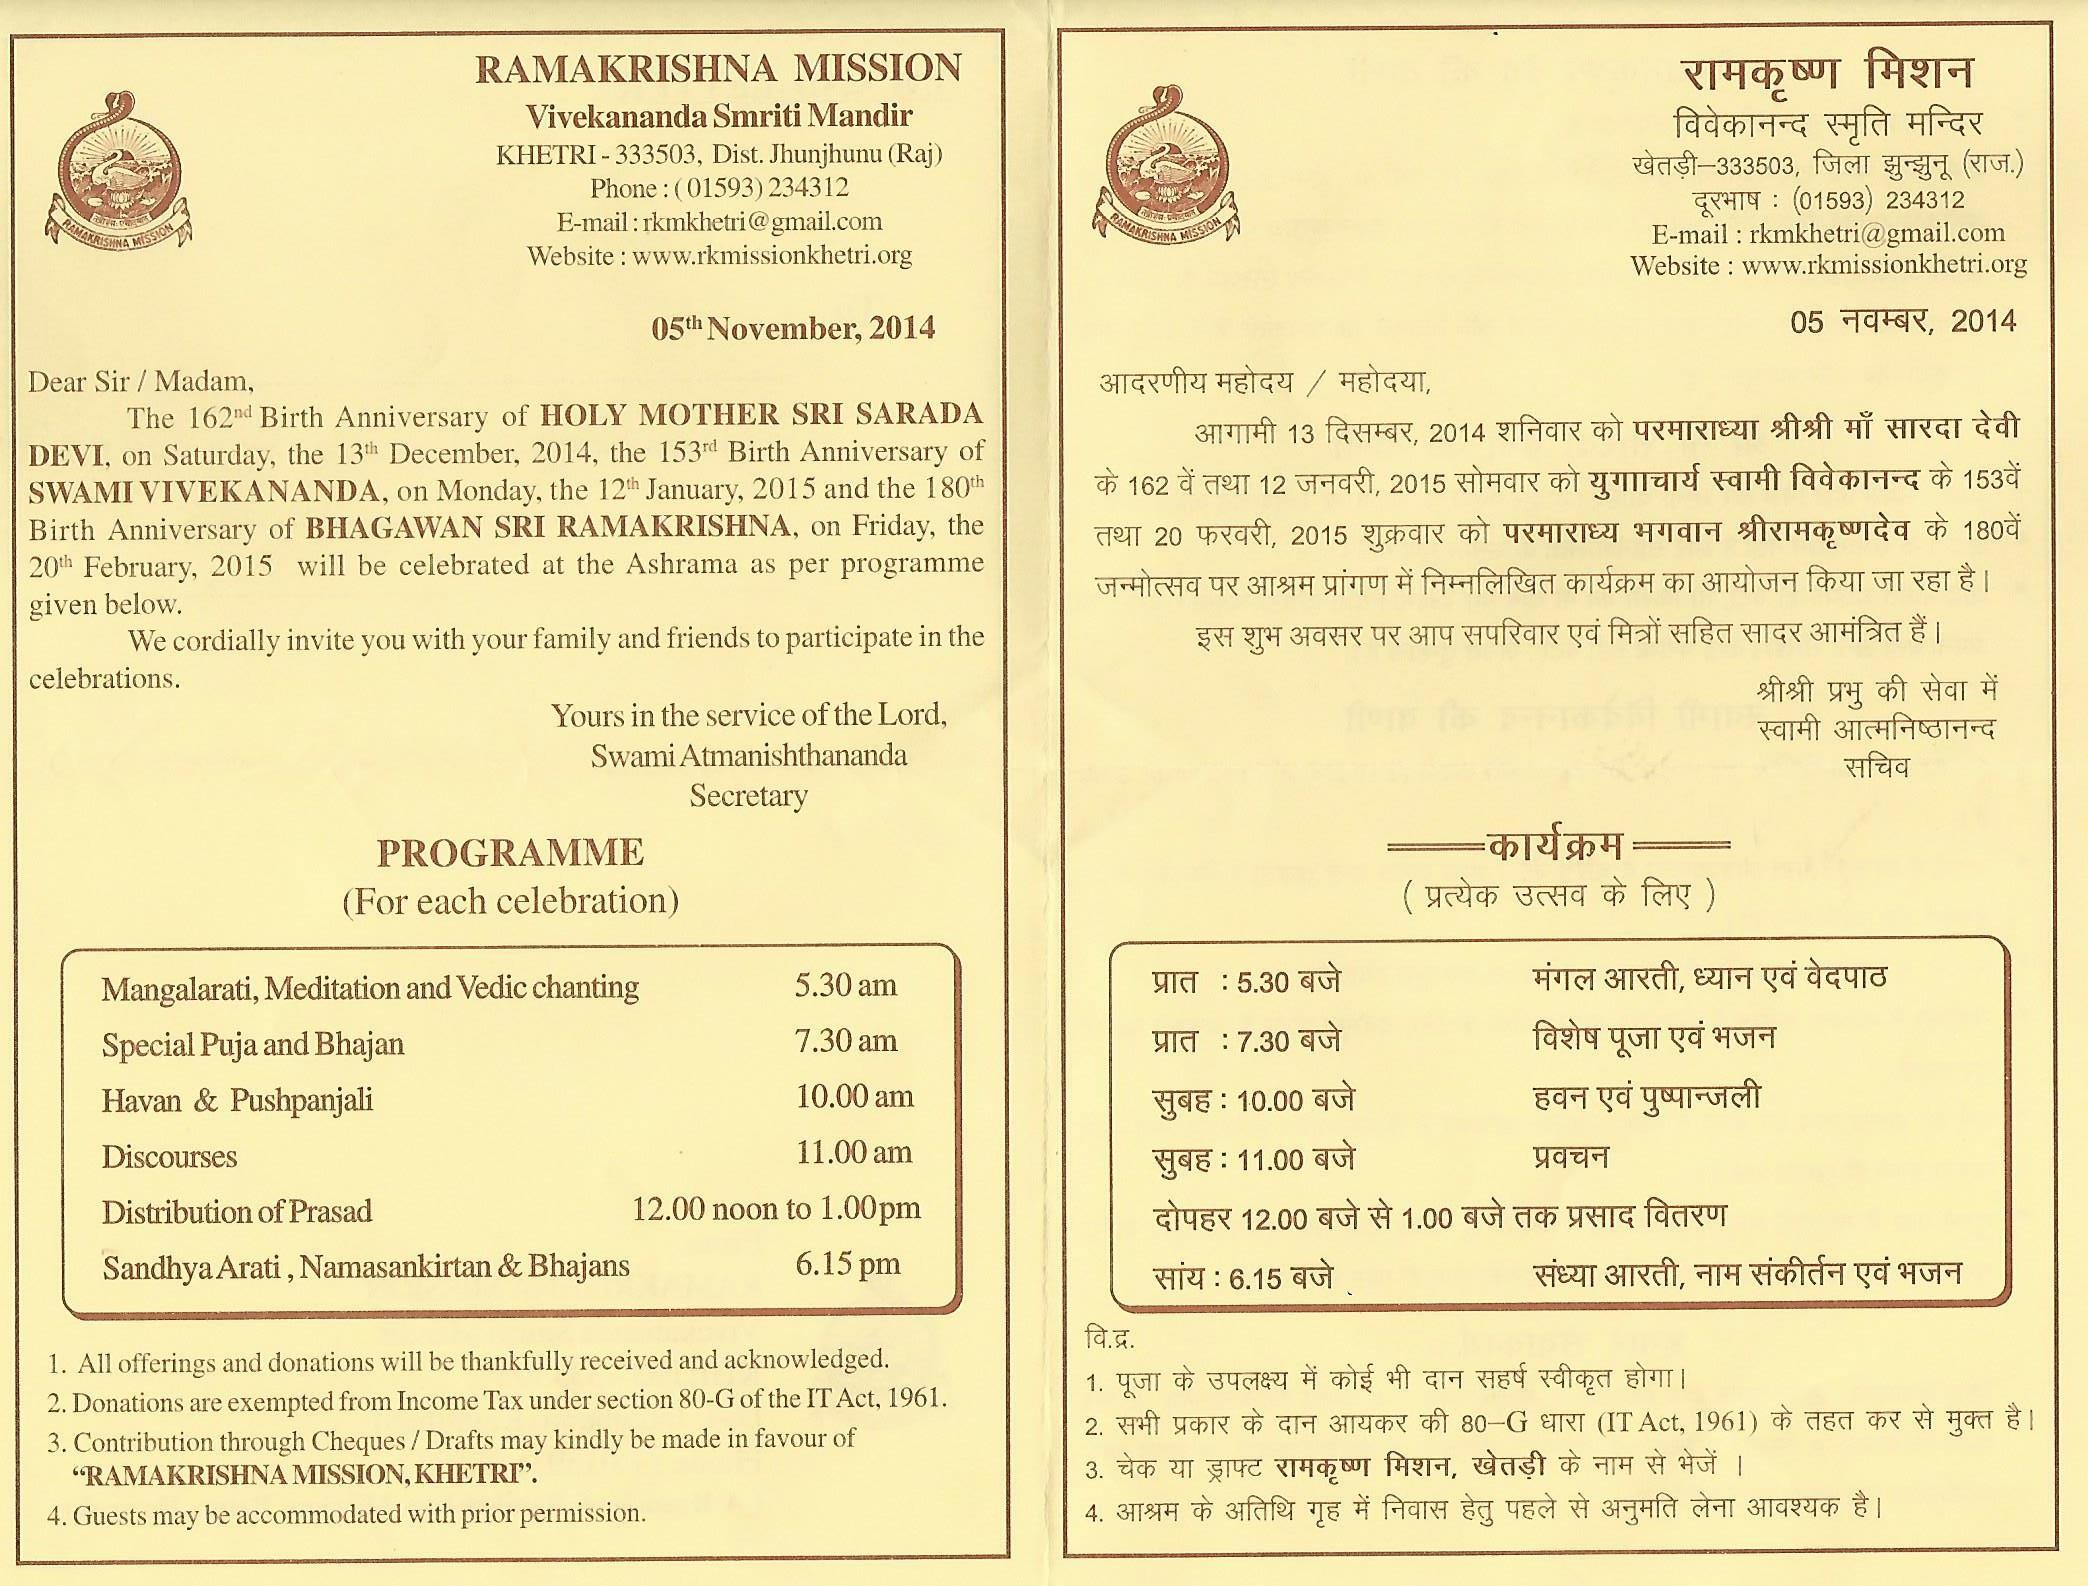 Invitation Letter Of Virasat Diaws Thakur Maa And Swamiji S